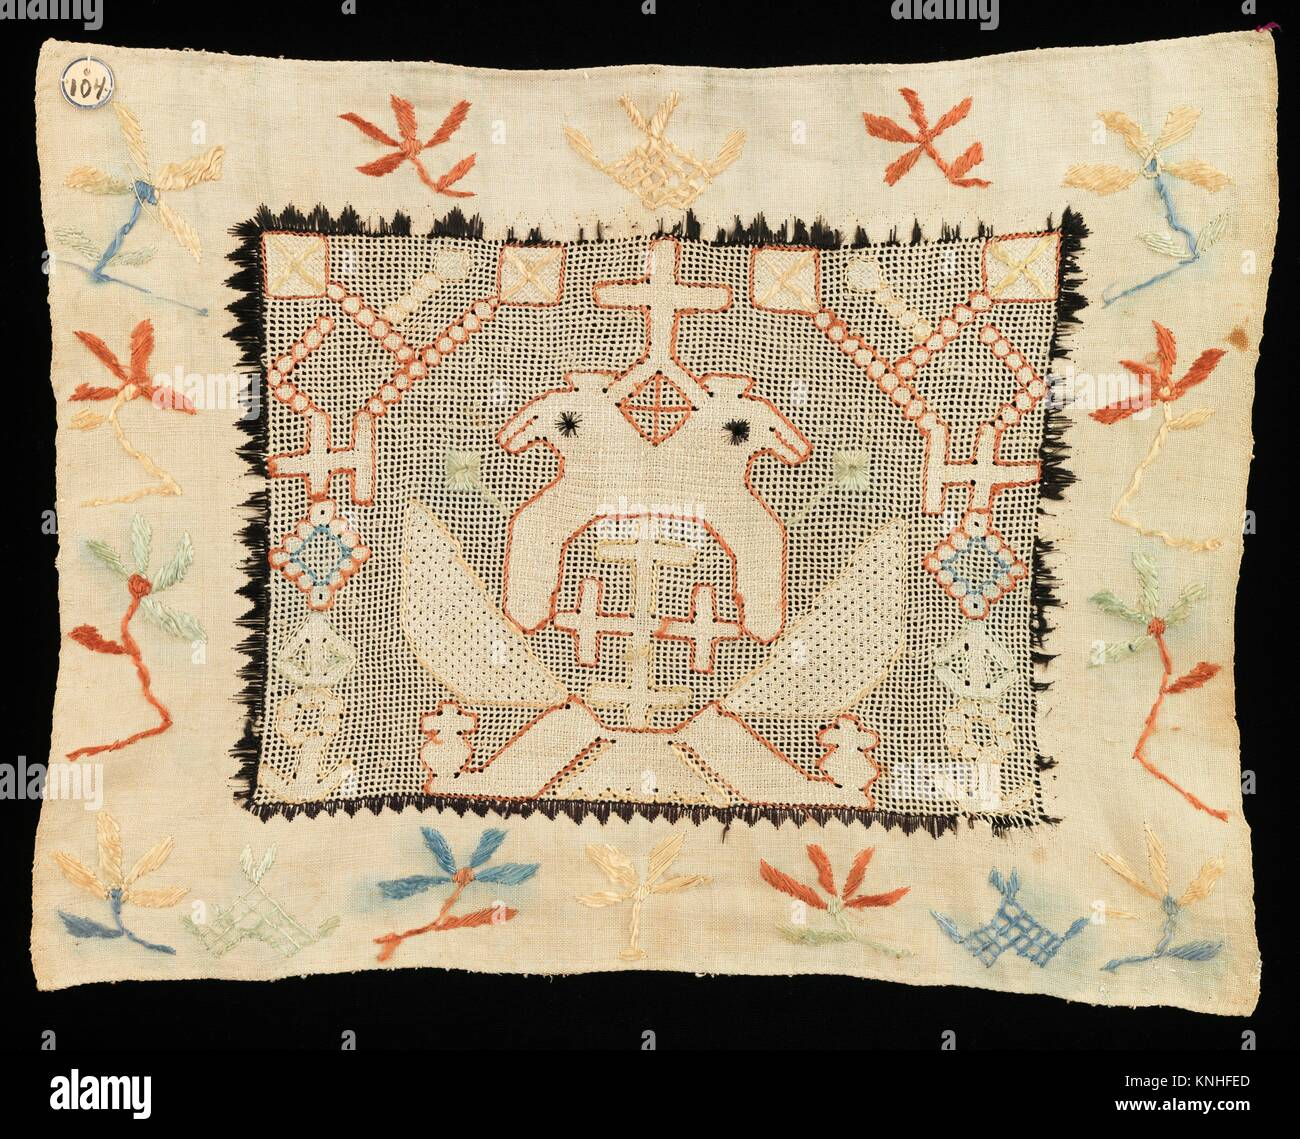 Towel border. Date: 1780-1820; Culture: Russian; Medium: Linen, silk; Dimensions: 15 x 11 1/2 in. (38.1 x 29.2 cm); - Stock Image